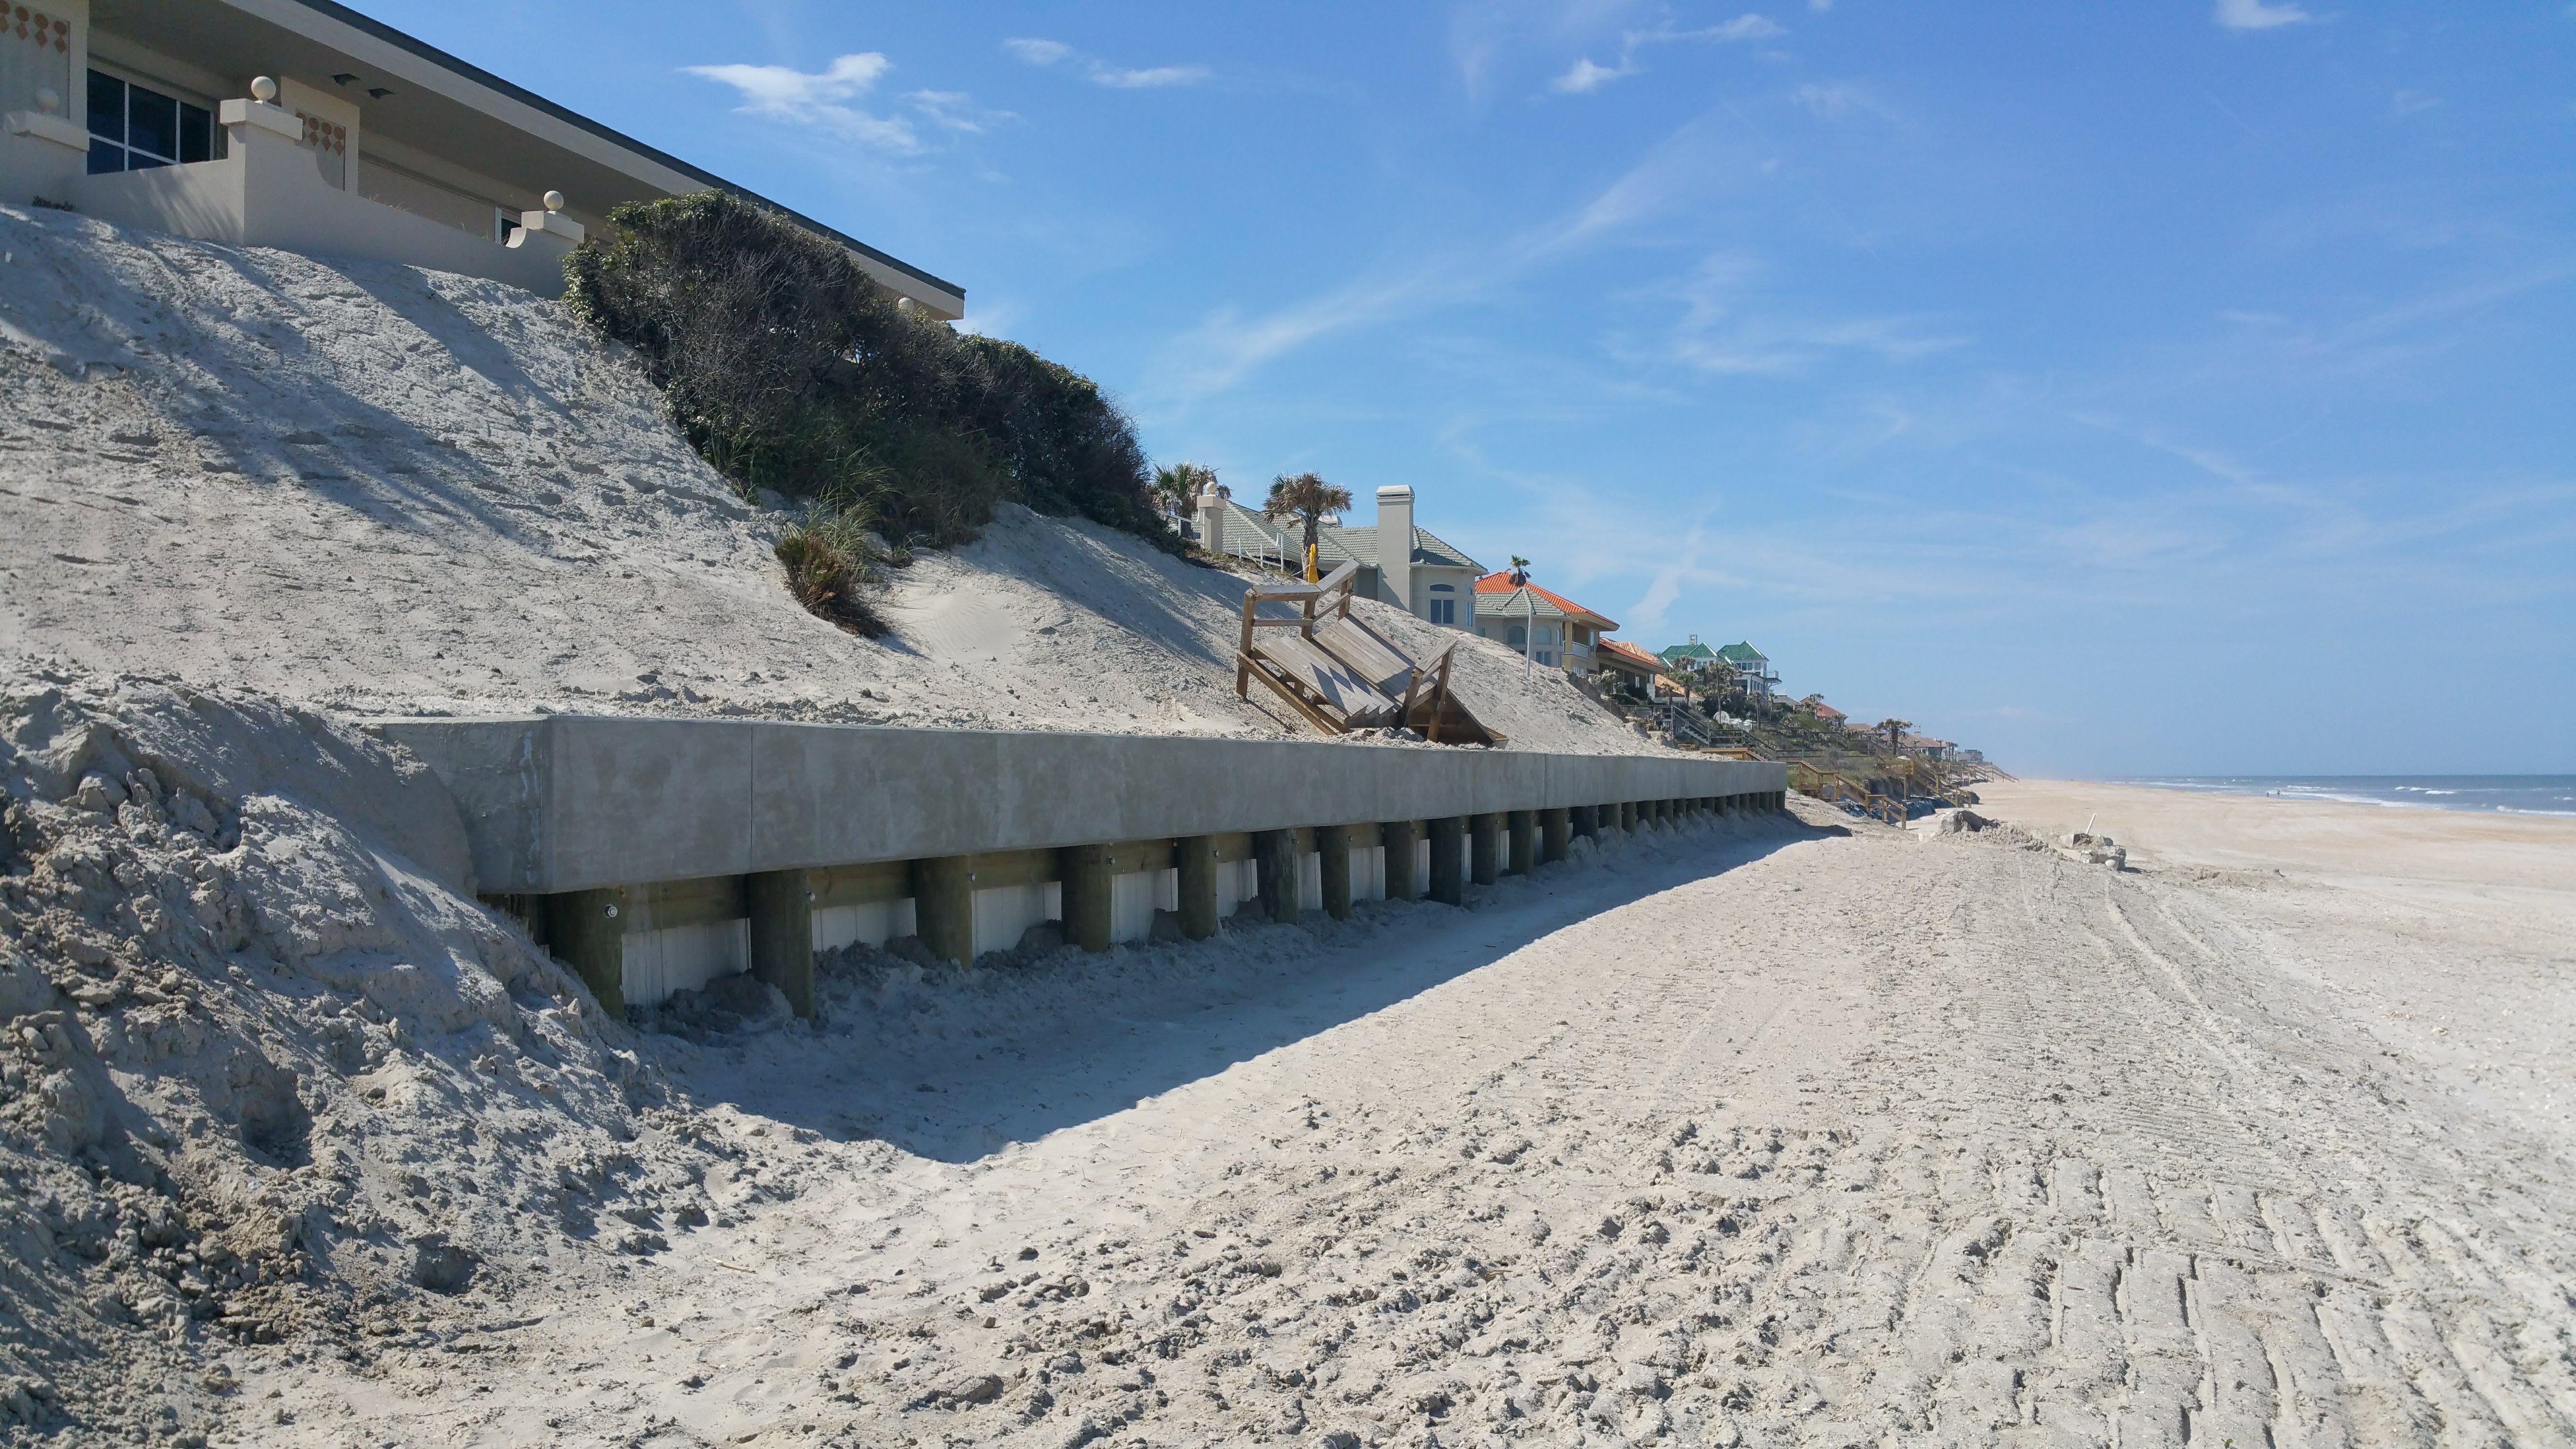 Truline Retaining Wall For Beach Erosion In Jacksonville Florida Retaining Wall Landscape Beach